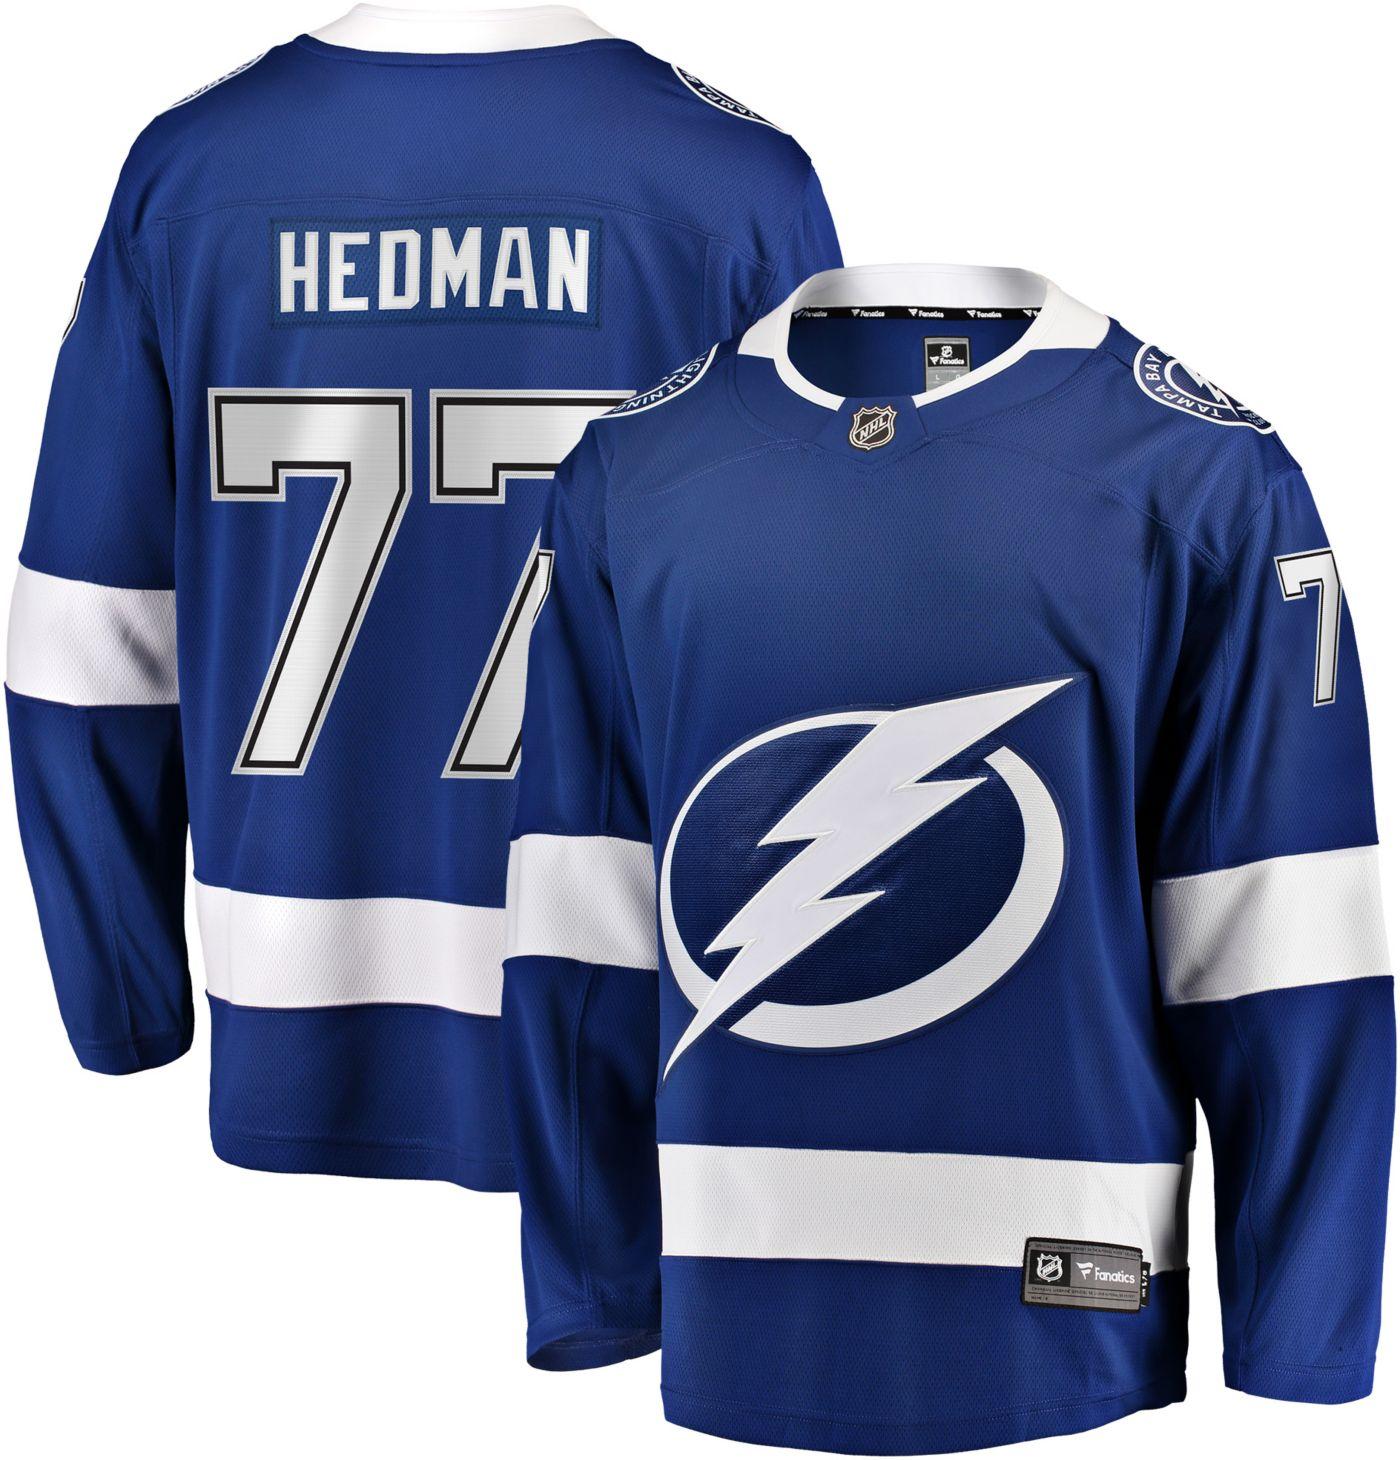 NHL Men's Tampa Bay Lightning Victor Headman #77 Breakaway Home Replica Jersey